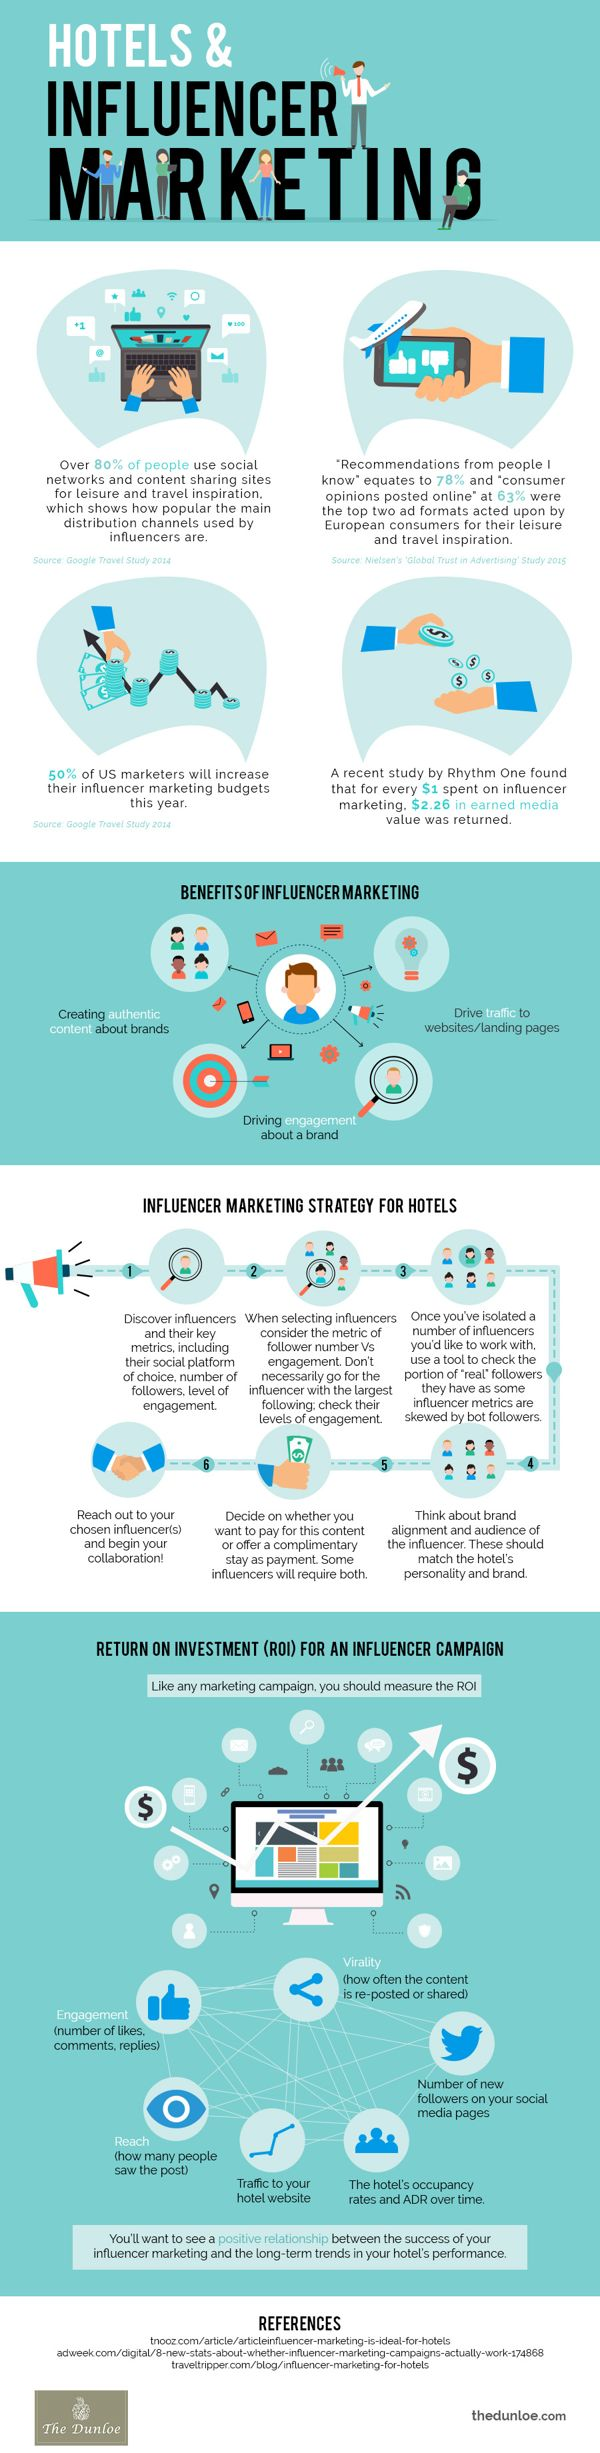 Hotels & Influencer Marketing 1